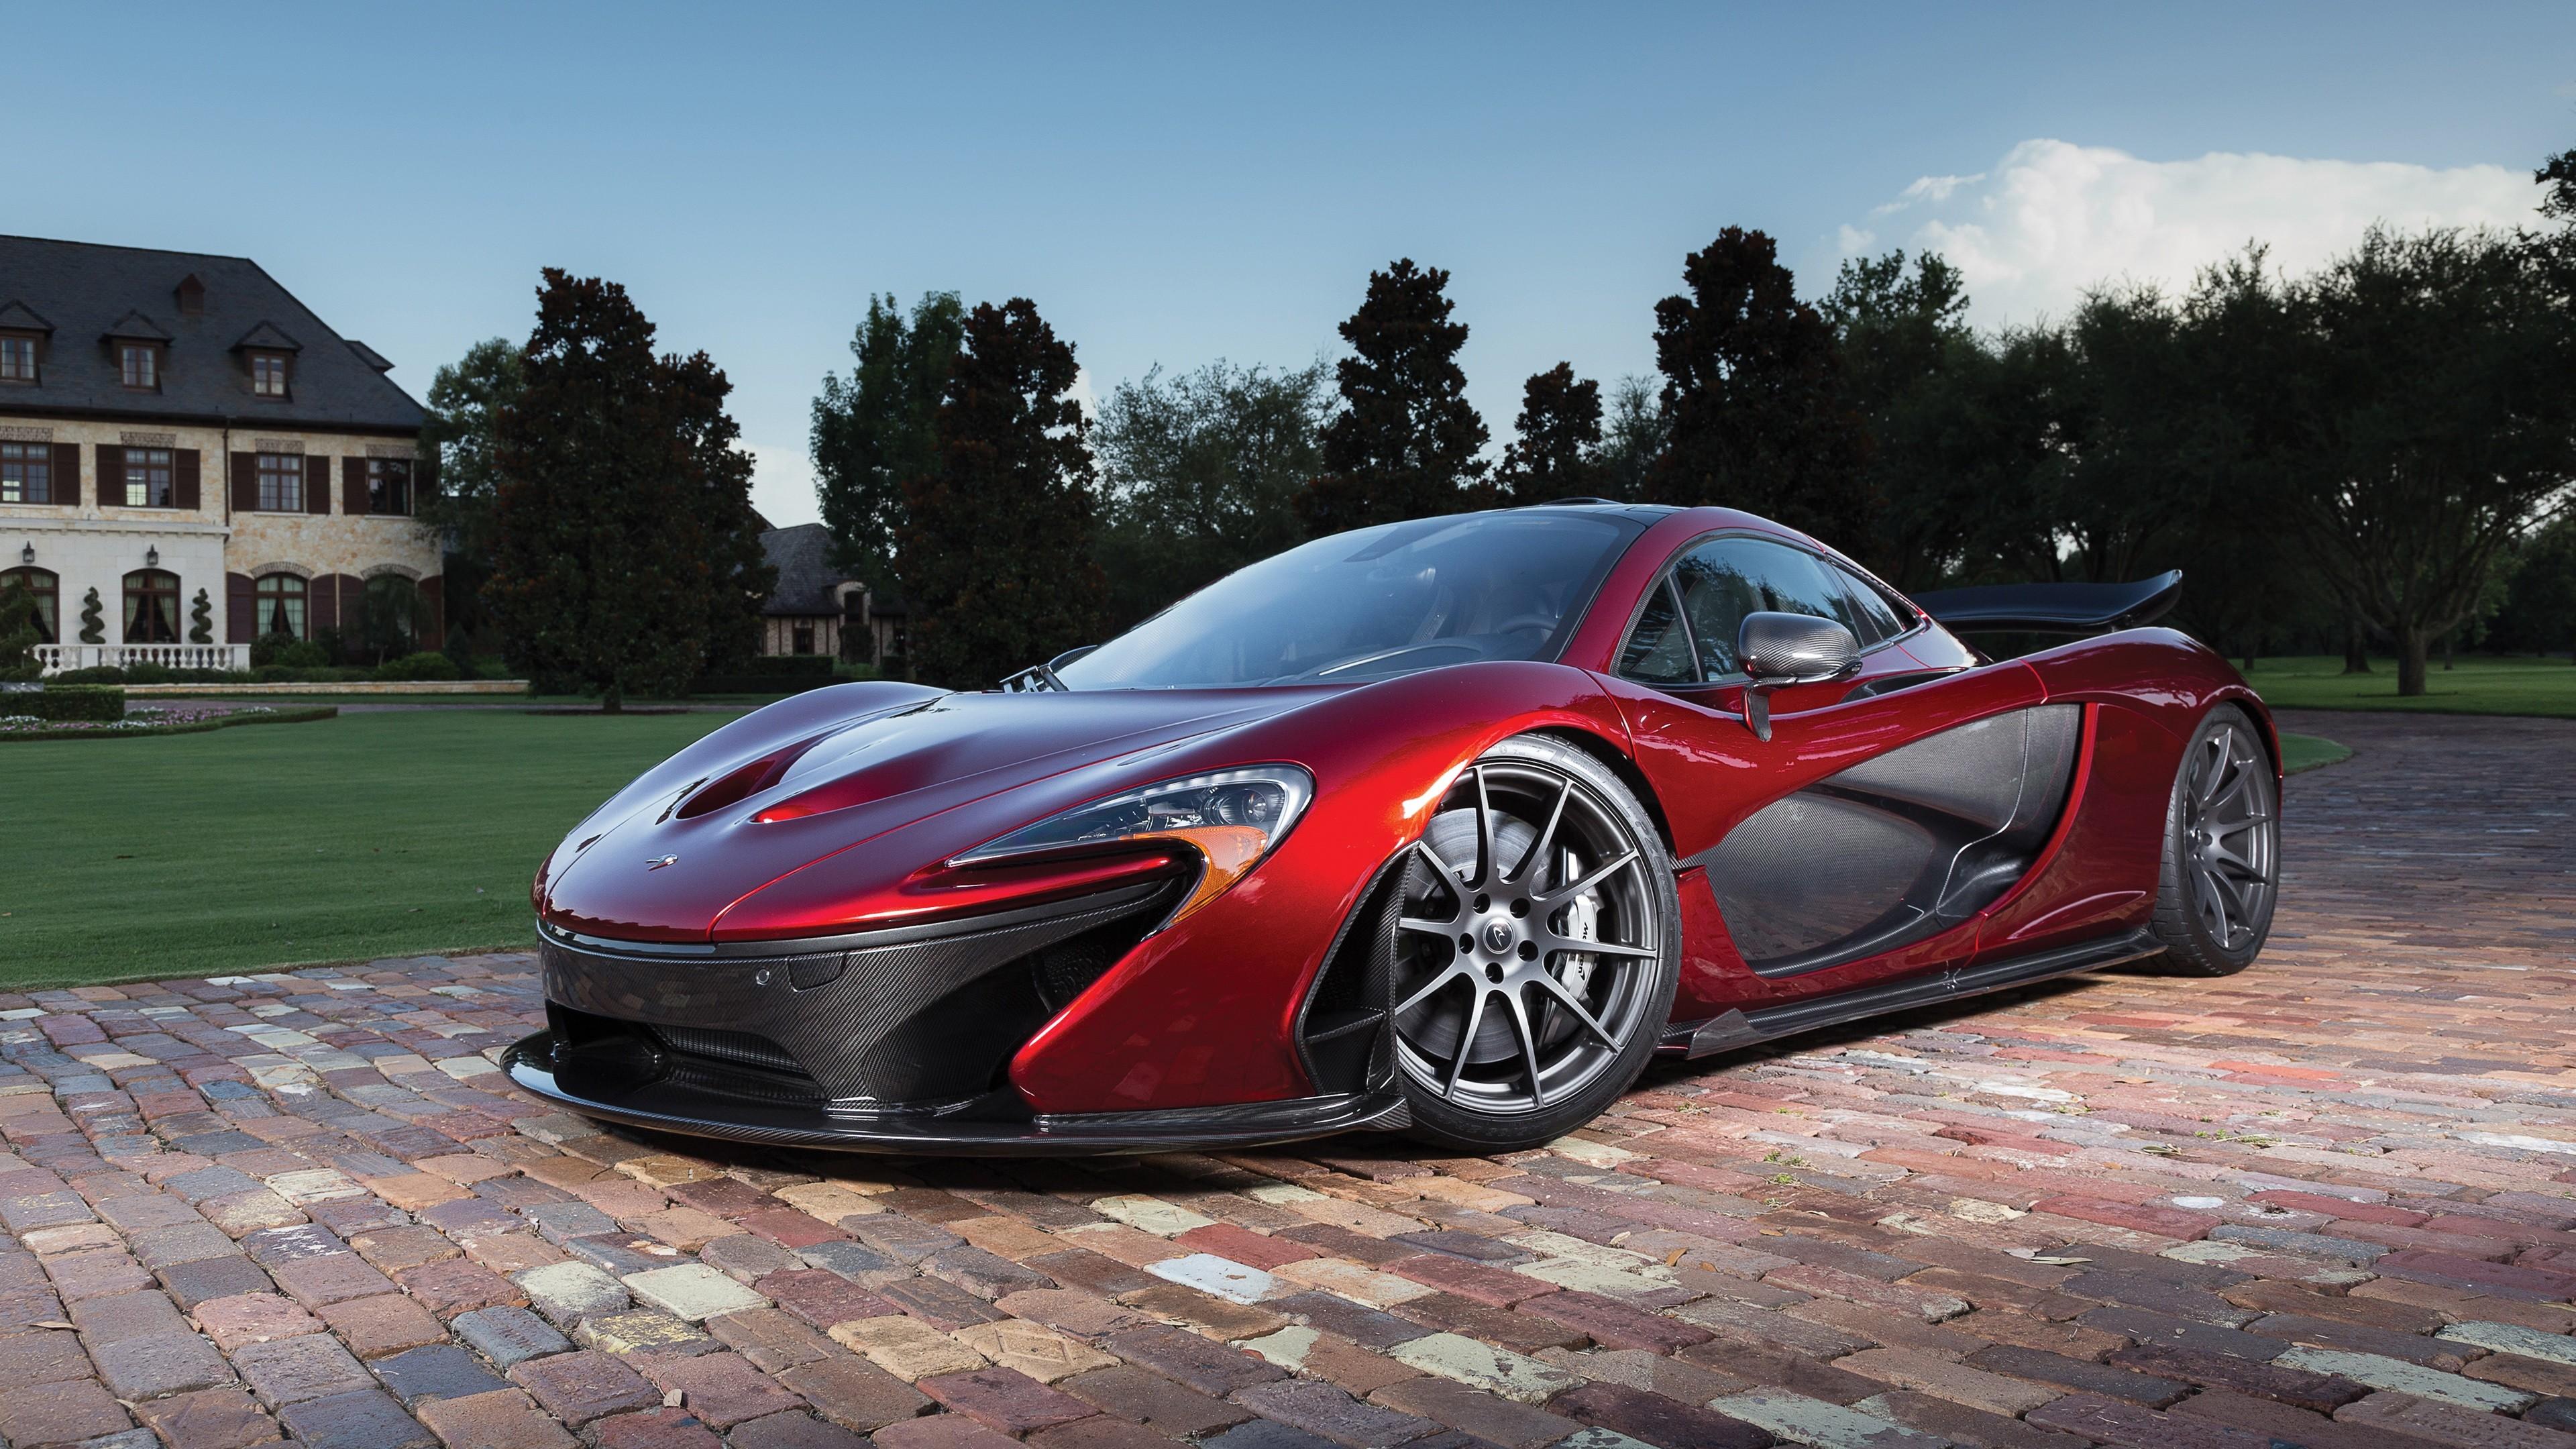 Res: 3840x2160, McLaren P1 red supercar at dusk 4k Ultra HD Wallpaper